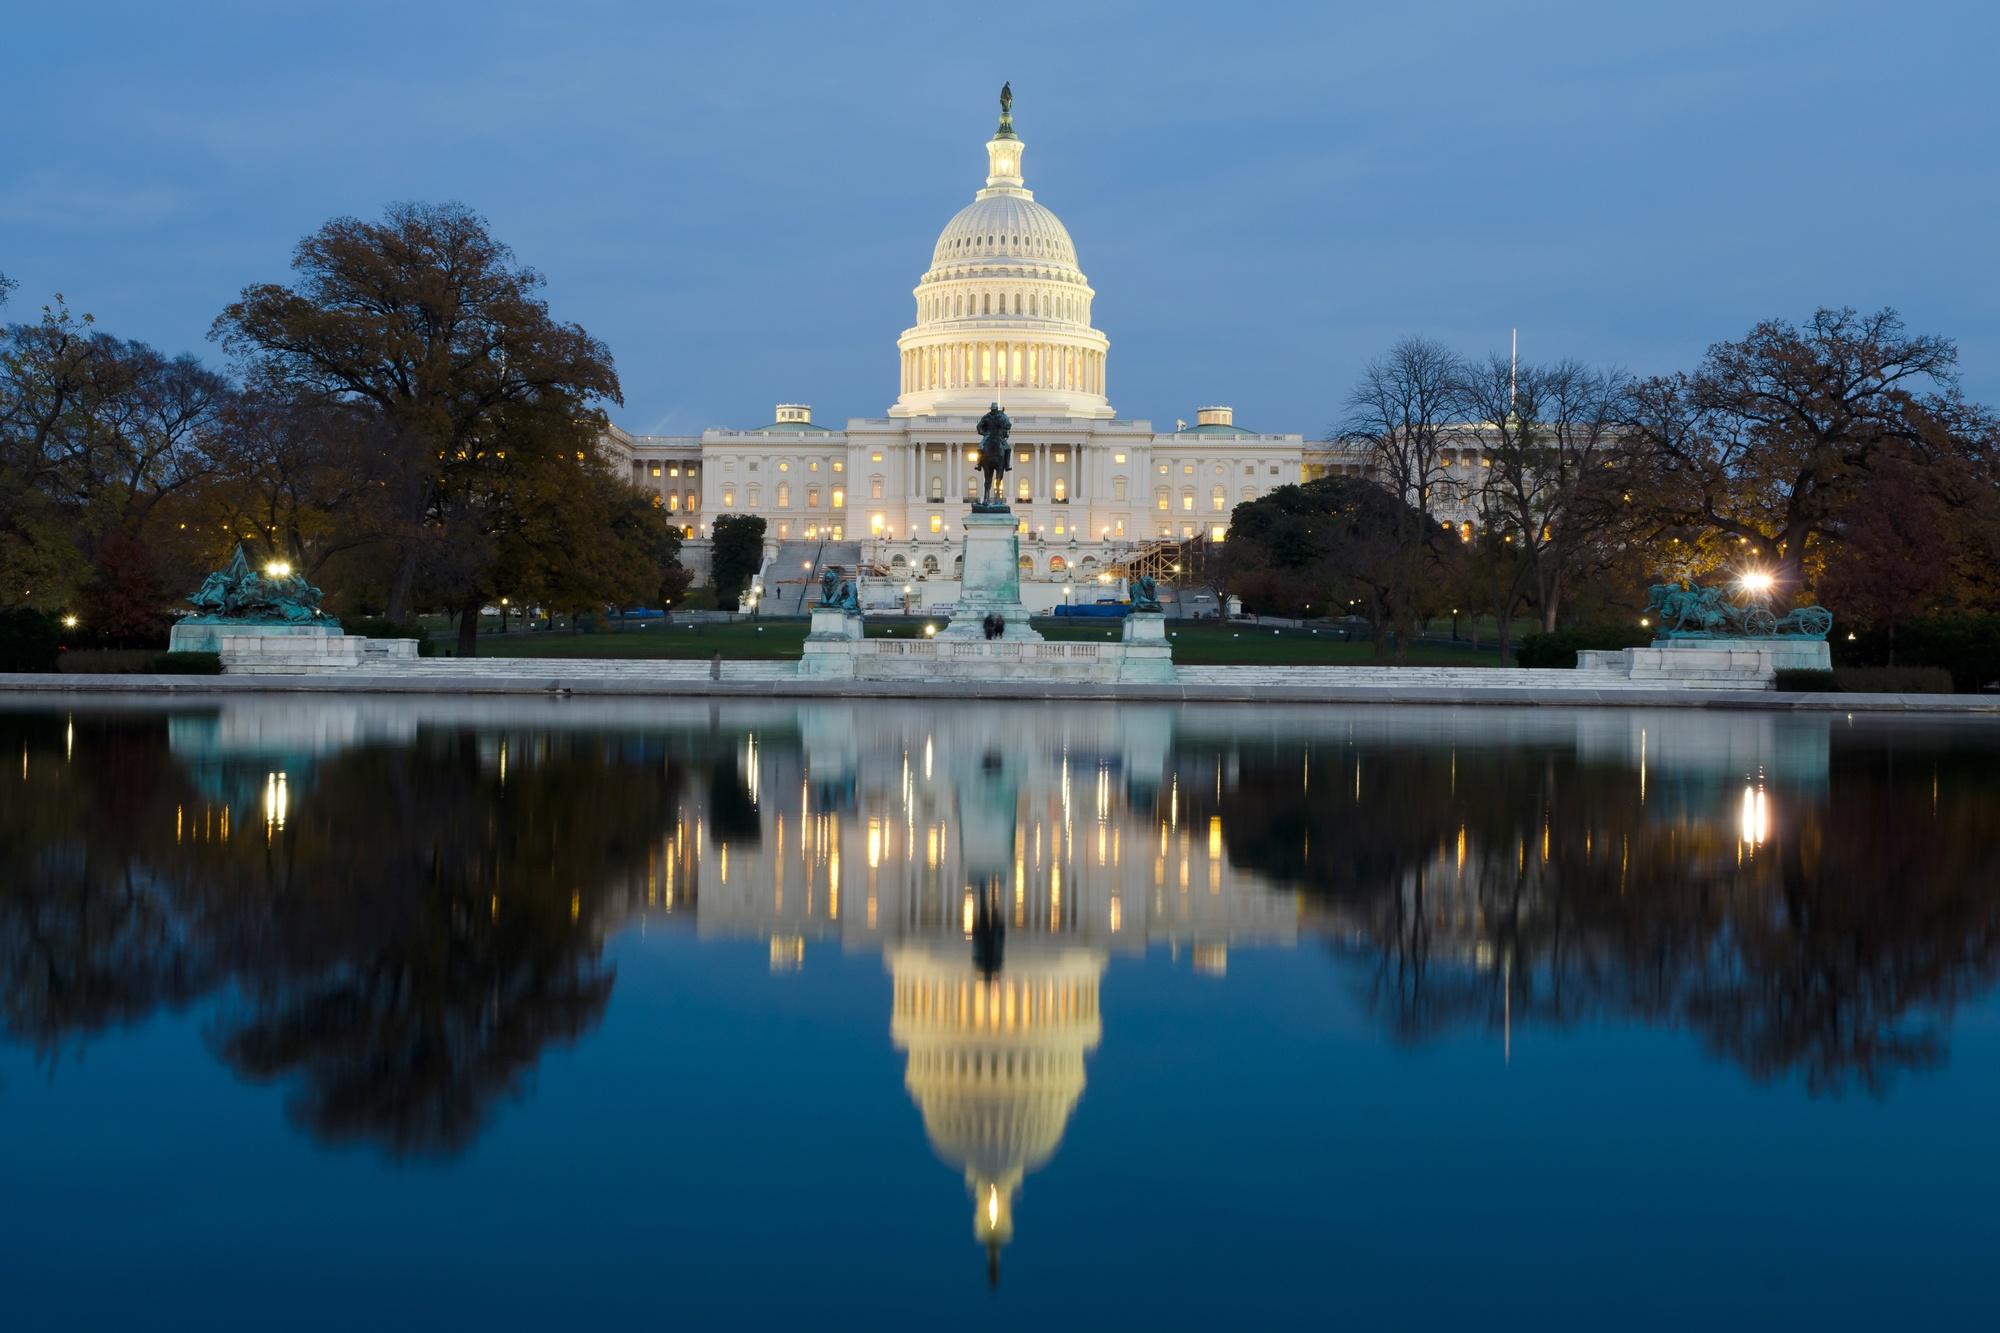 Repeal of ACA Halted After Senate Republican Health Care Bill Falters